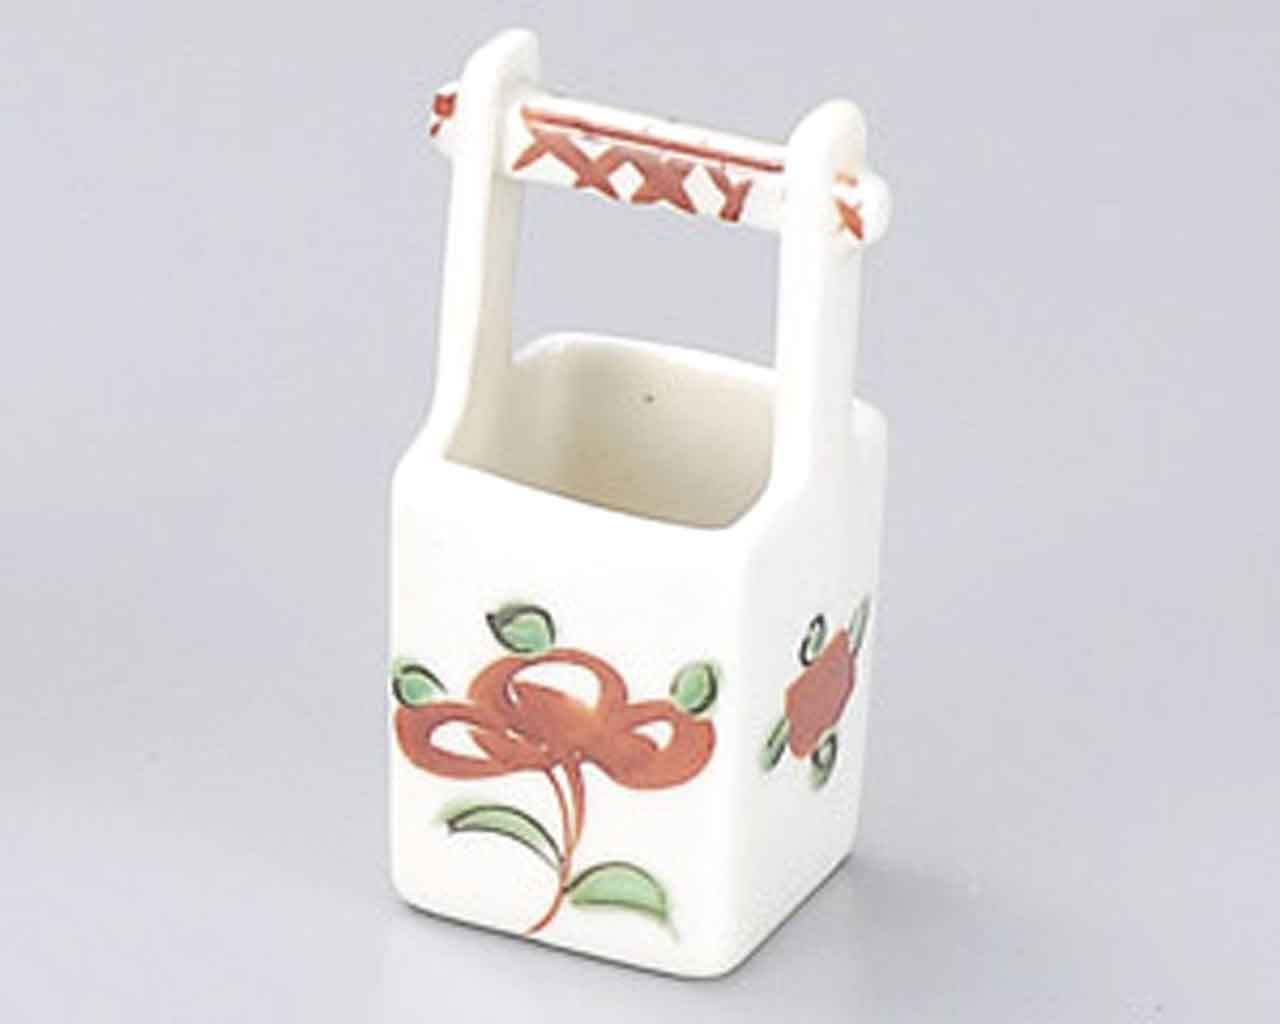 Akae Flower 1.9inch Set of 2 Toothpick holders White porcelain Made in Japan